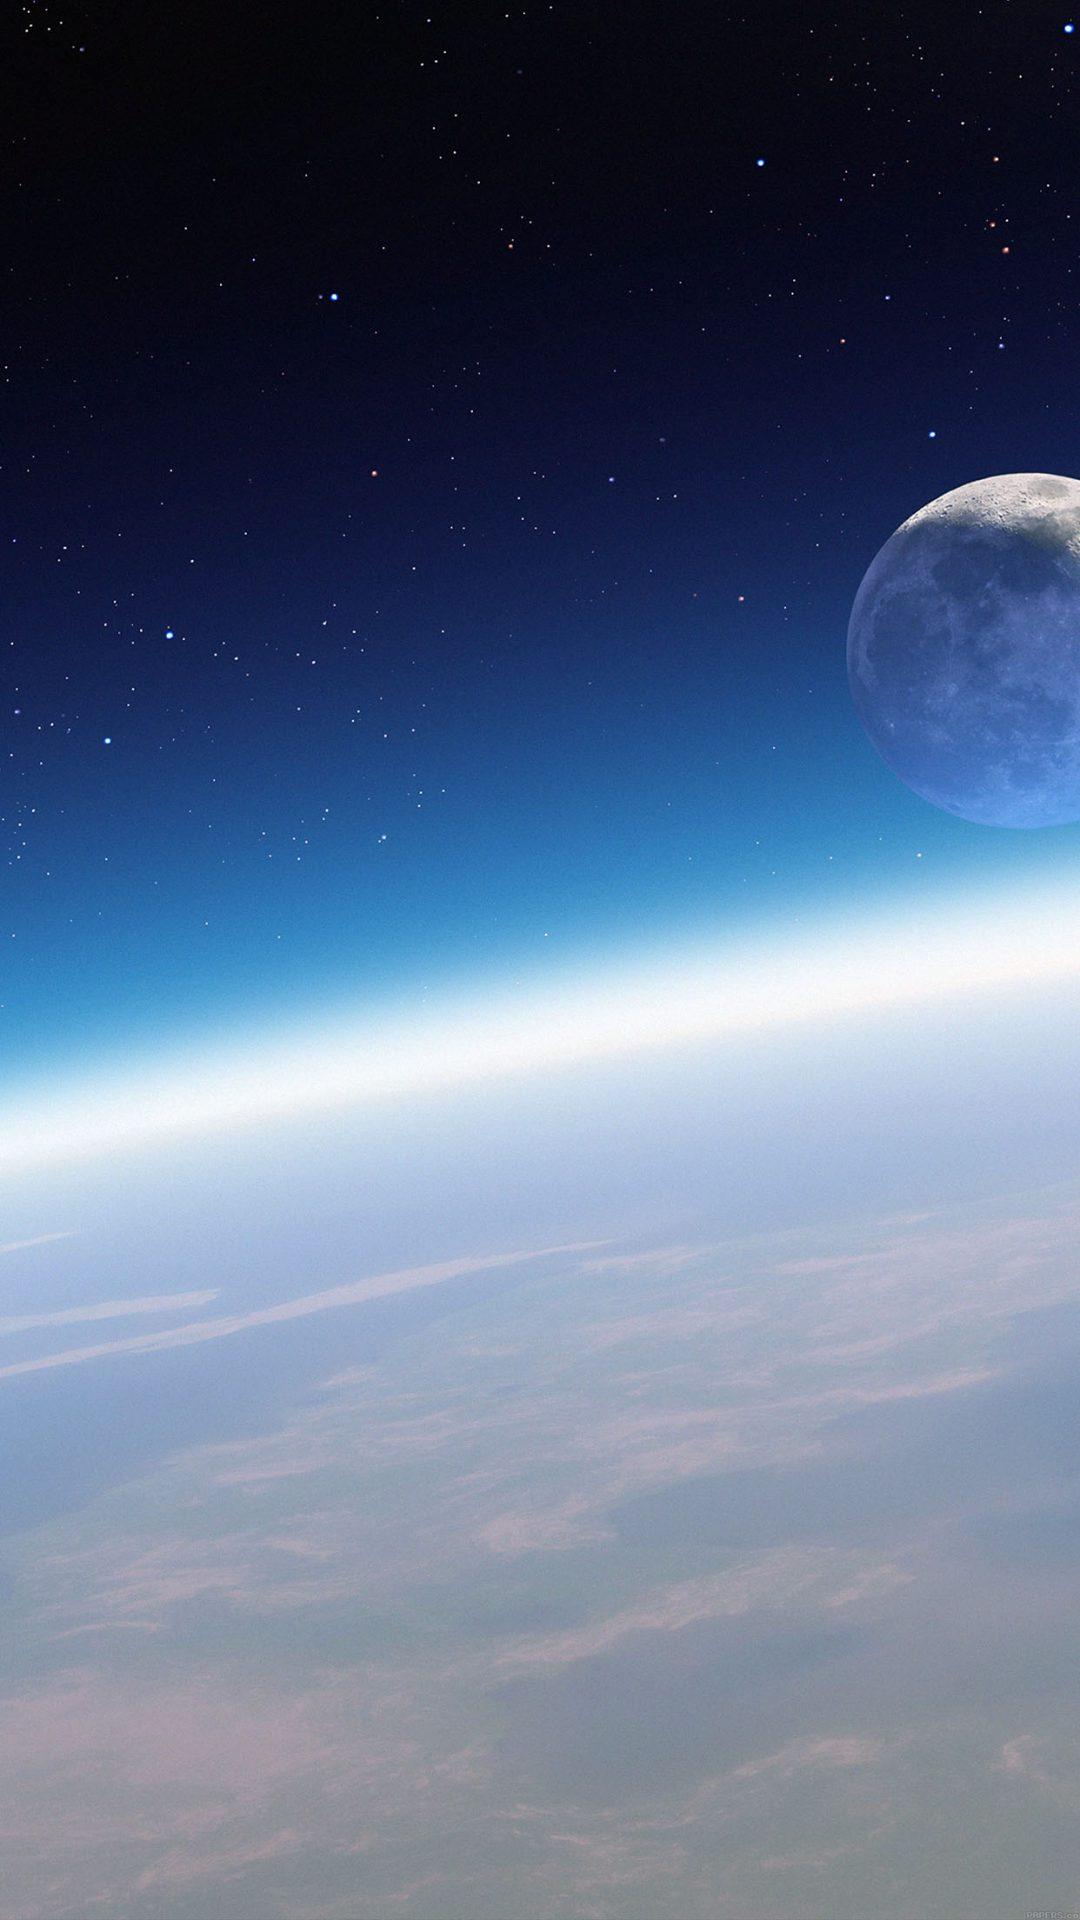 Wallpaper Earth Horizon In Space